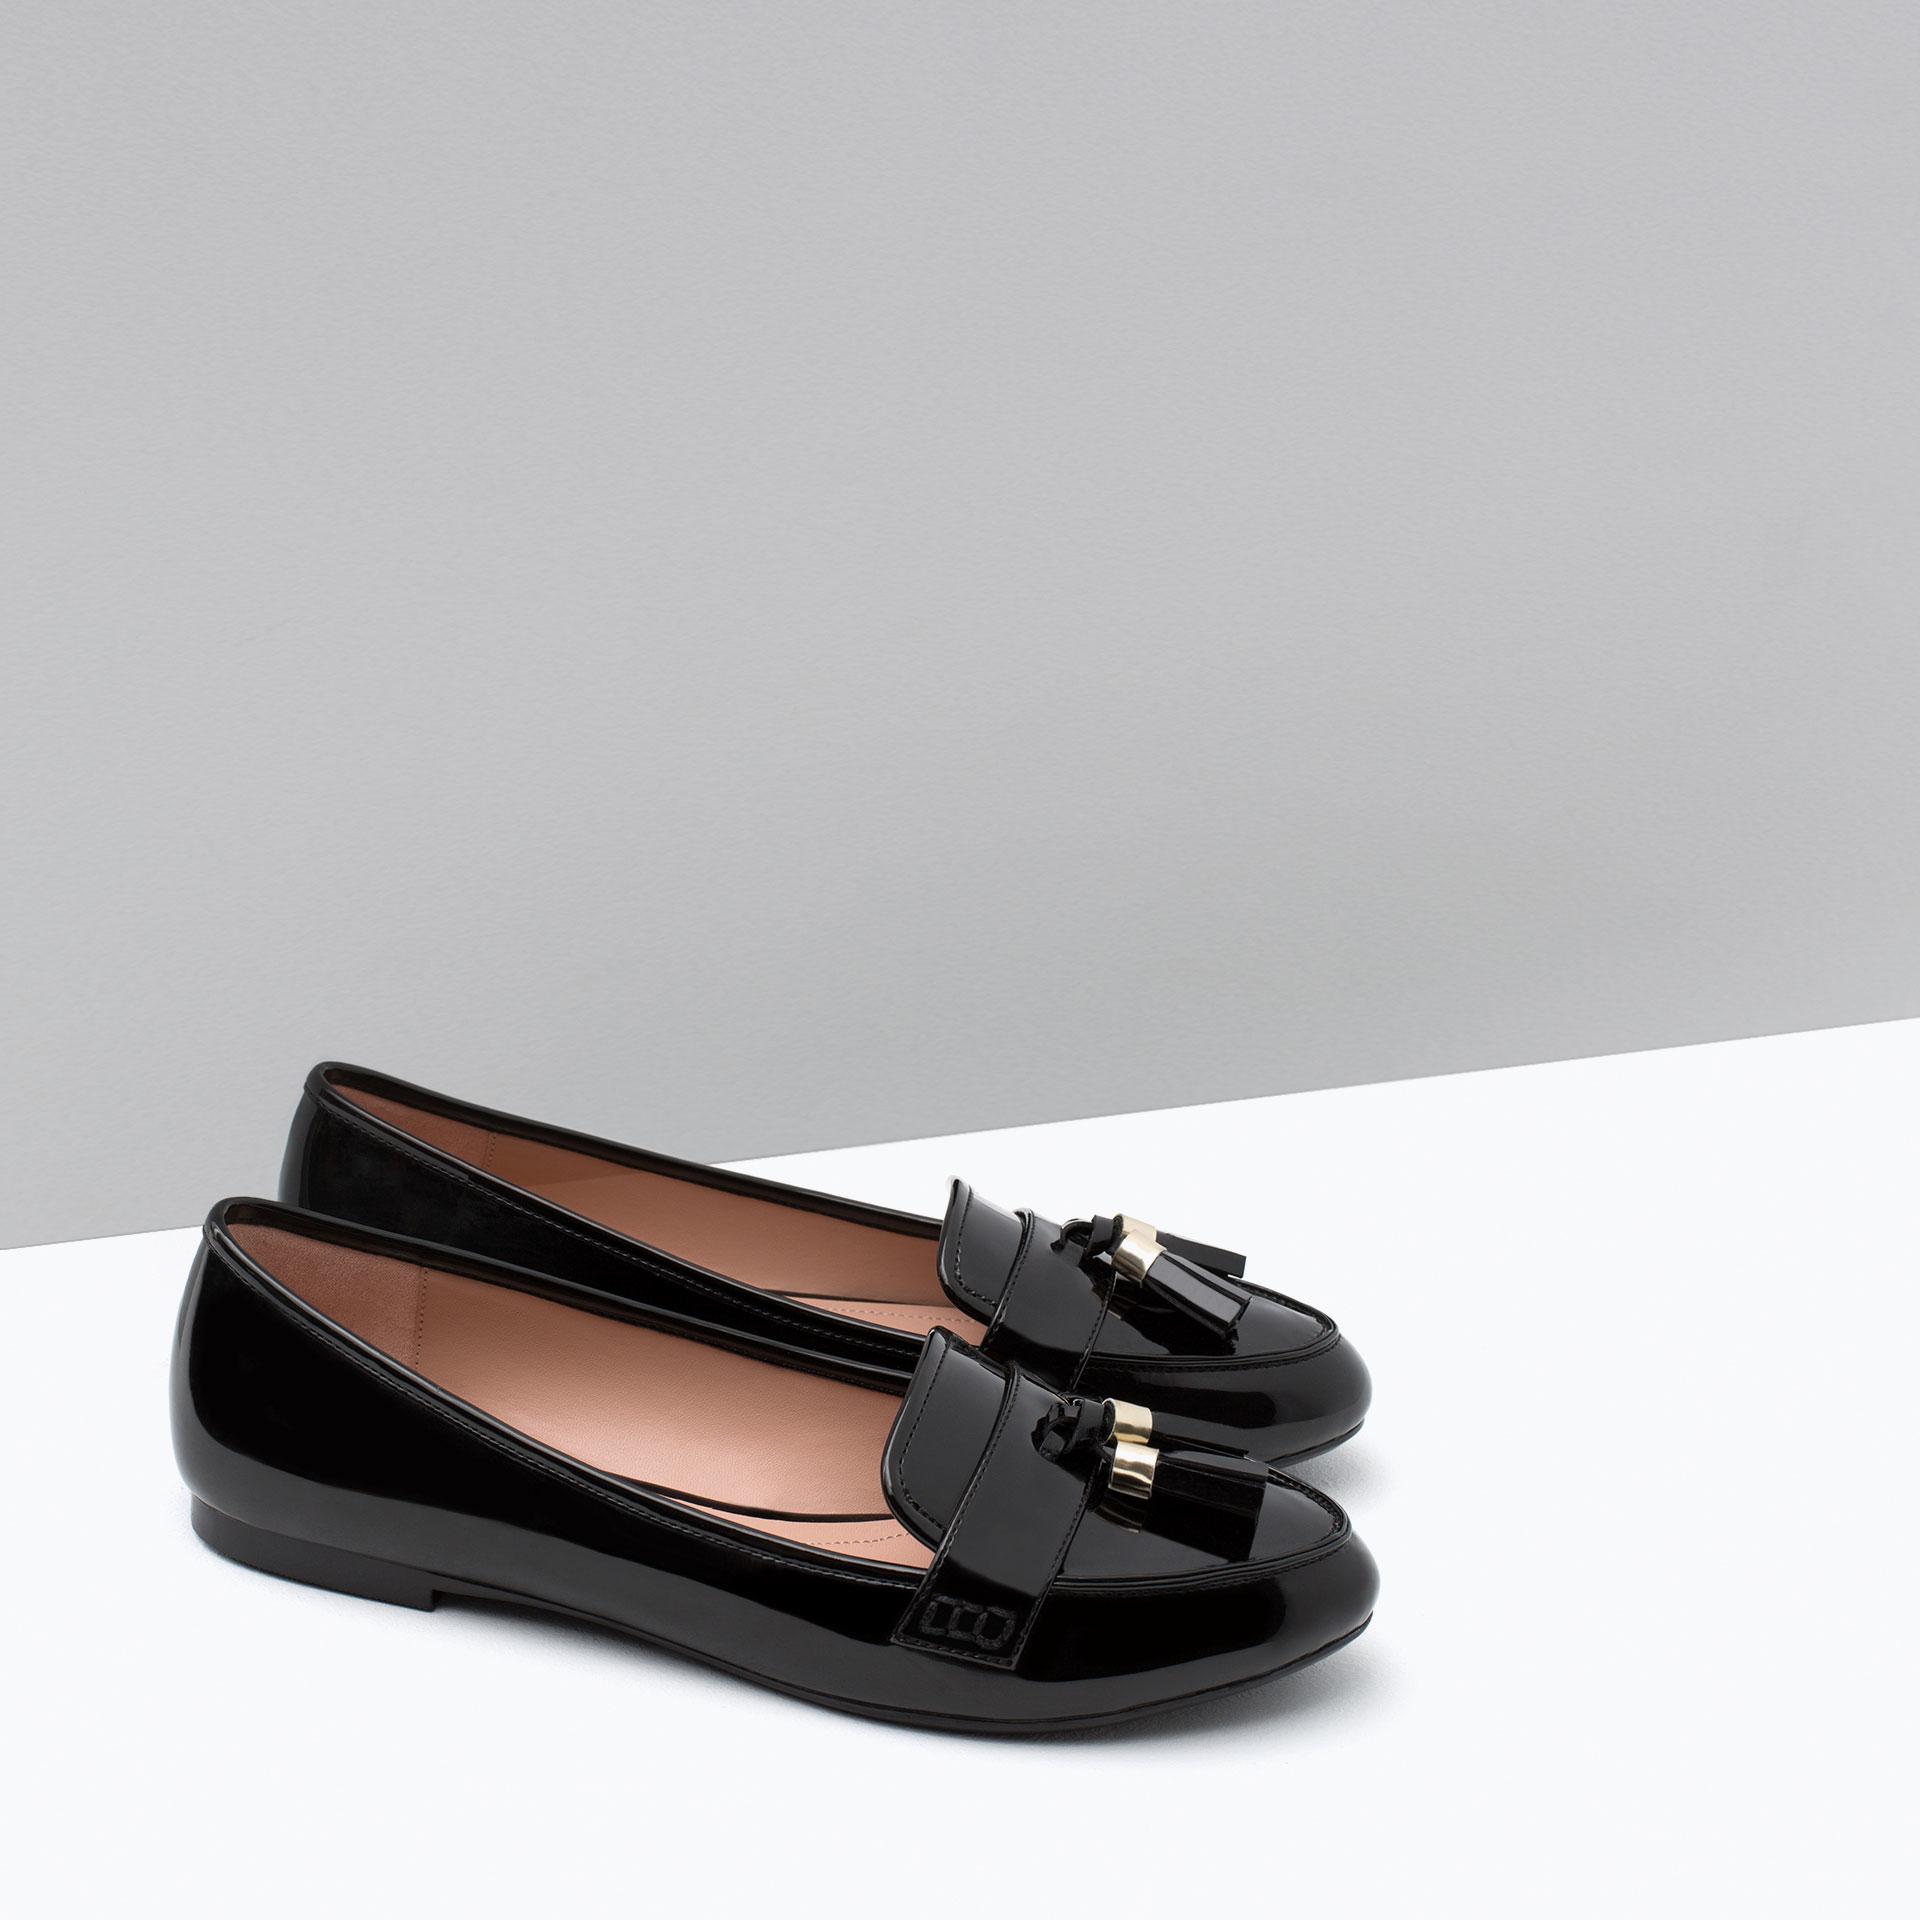 Zara Loafers With Tassels in Black